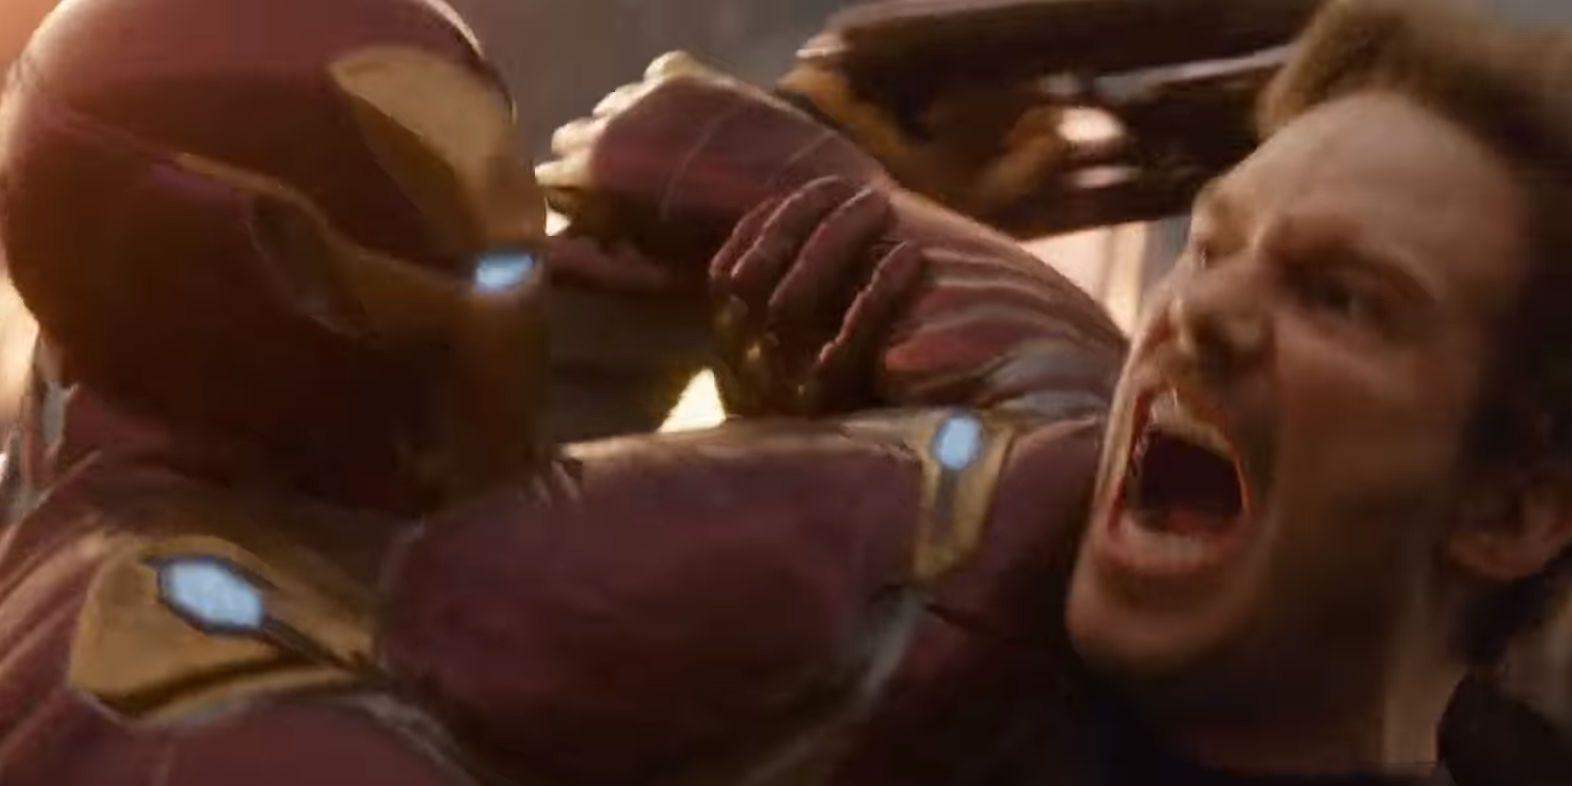 infinity war spot teases star-lord vs. iron man fight